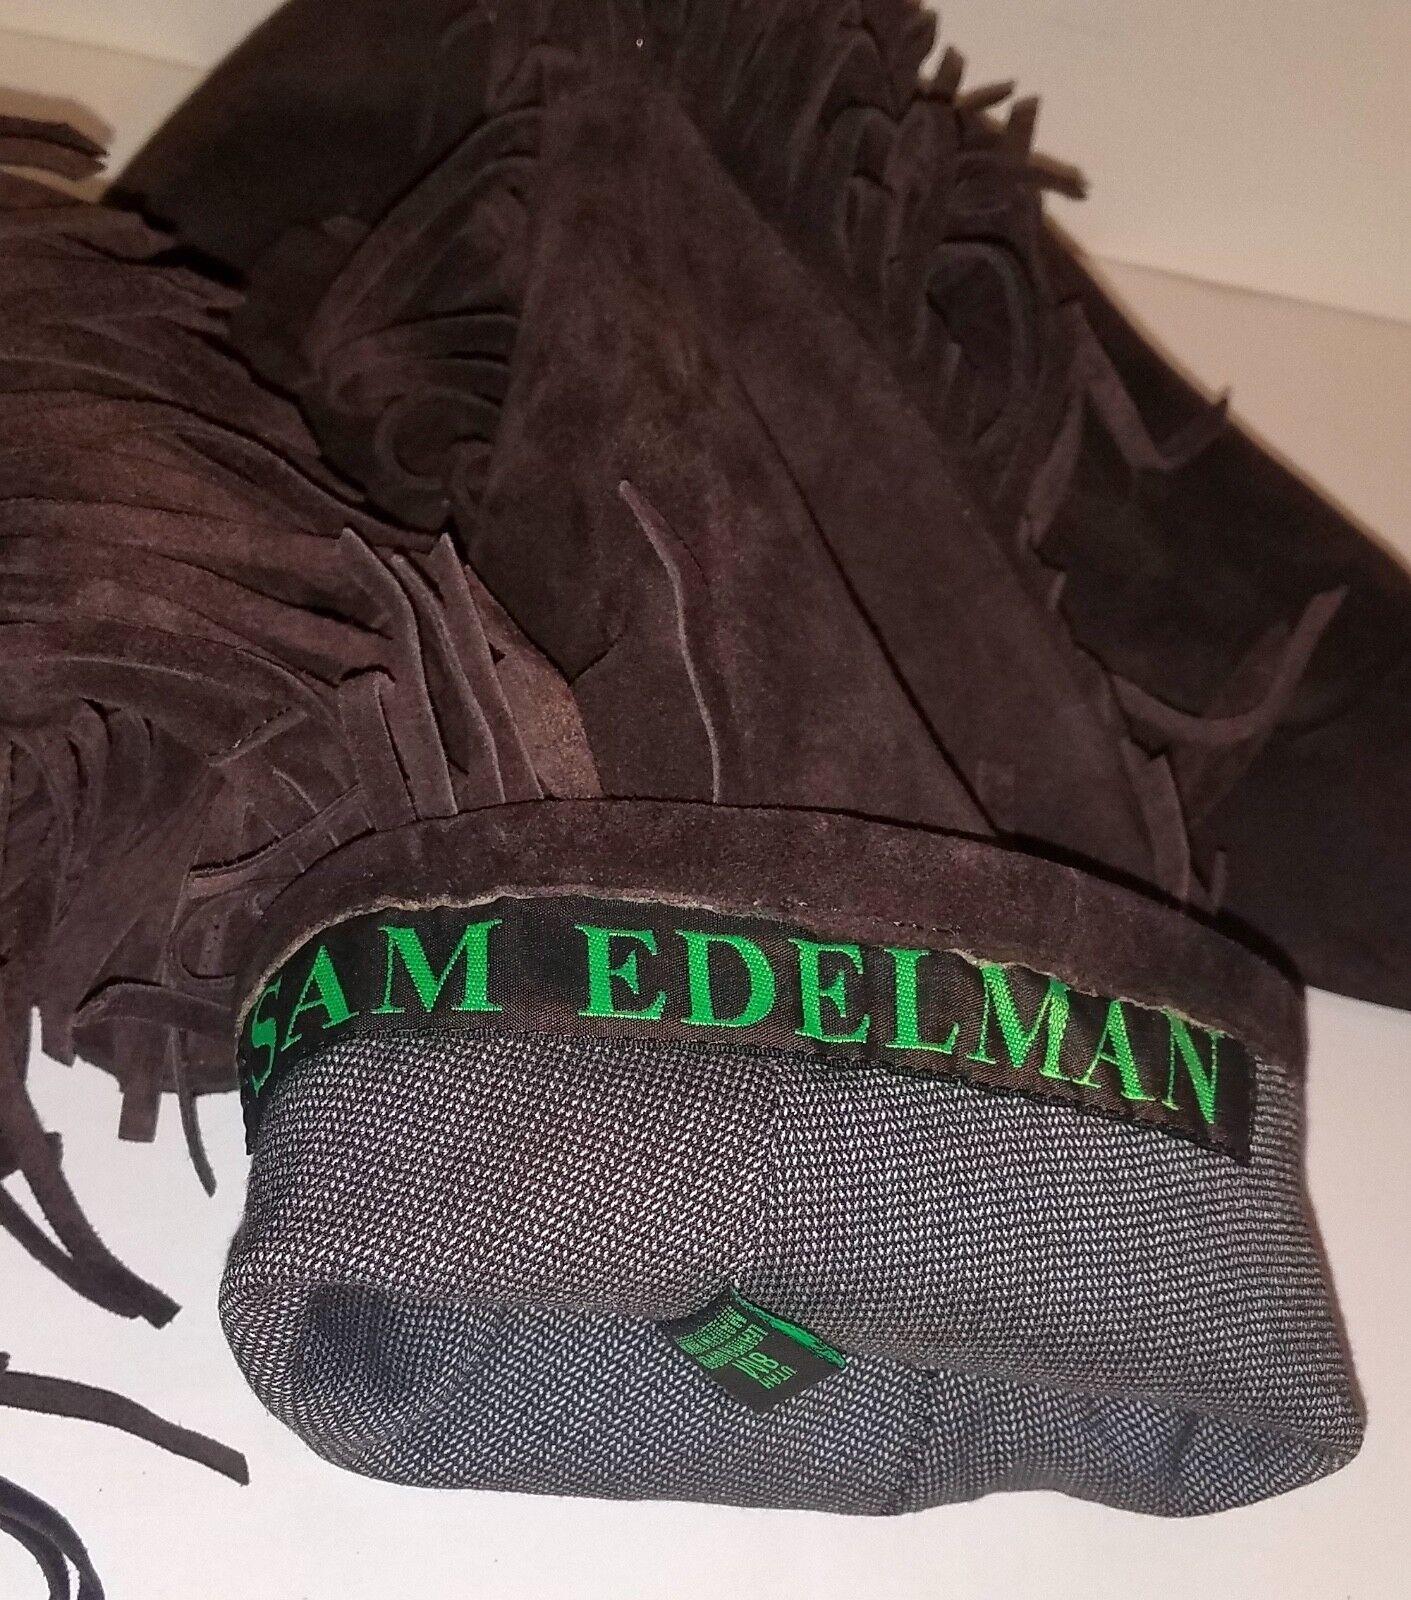 Sam Edelman Brown Suede Tall Flat Heel Boot Women Women's Women's Women's Boots UTAH Size 8 M 6de9d3